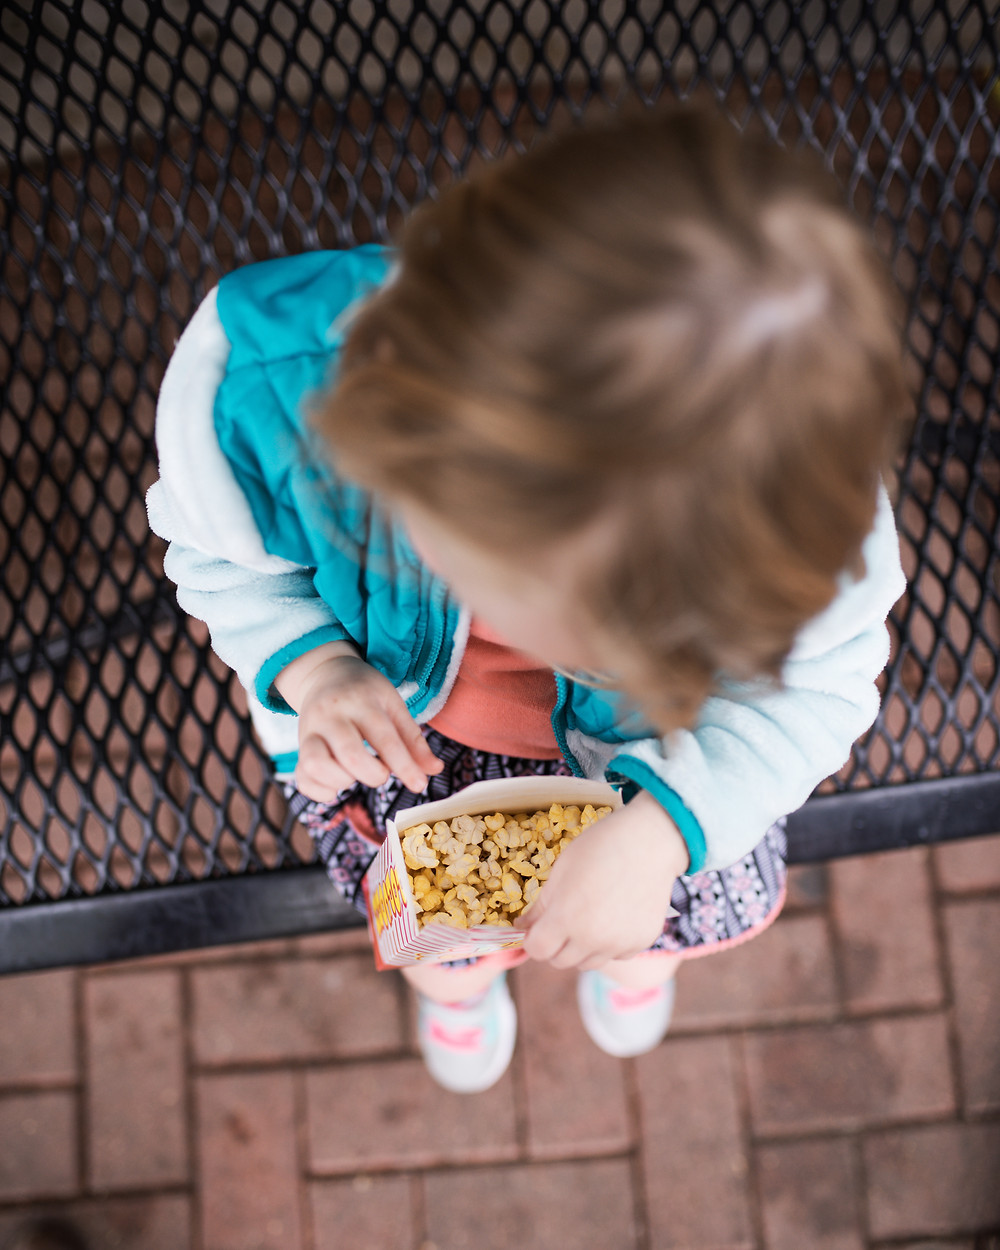 popcorn eating